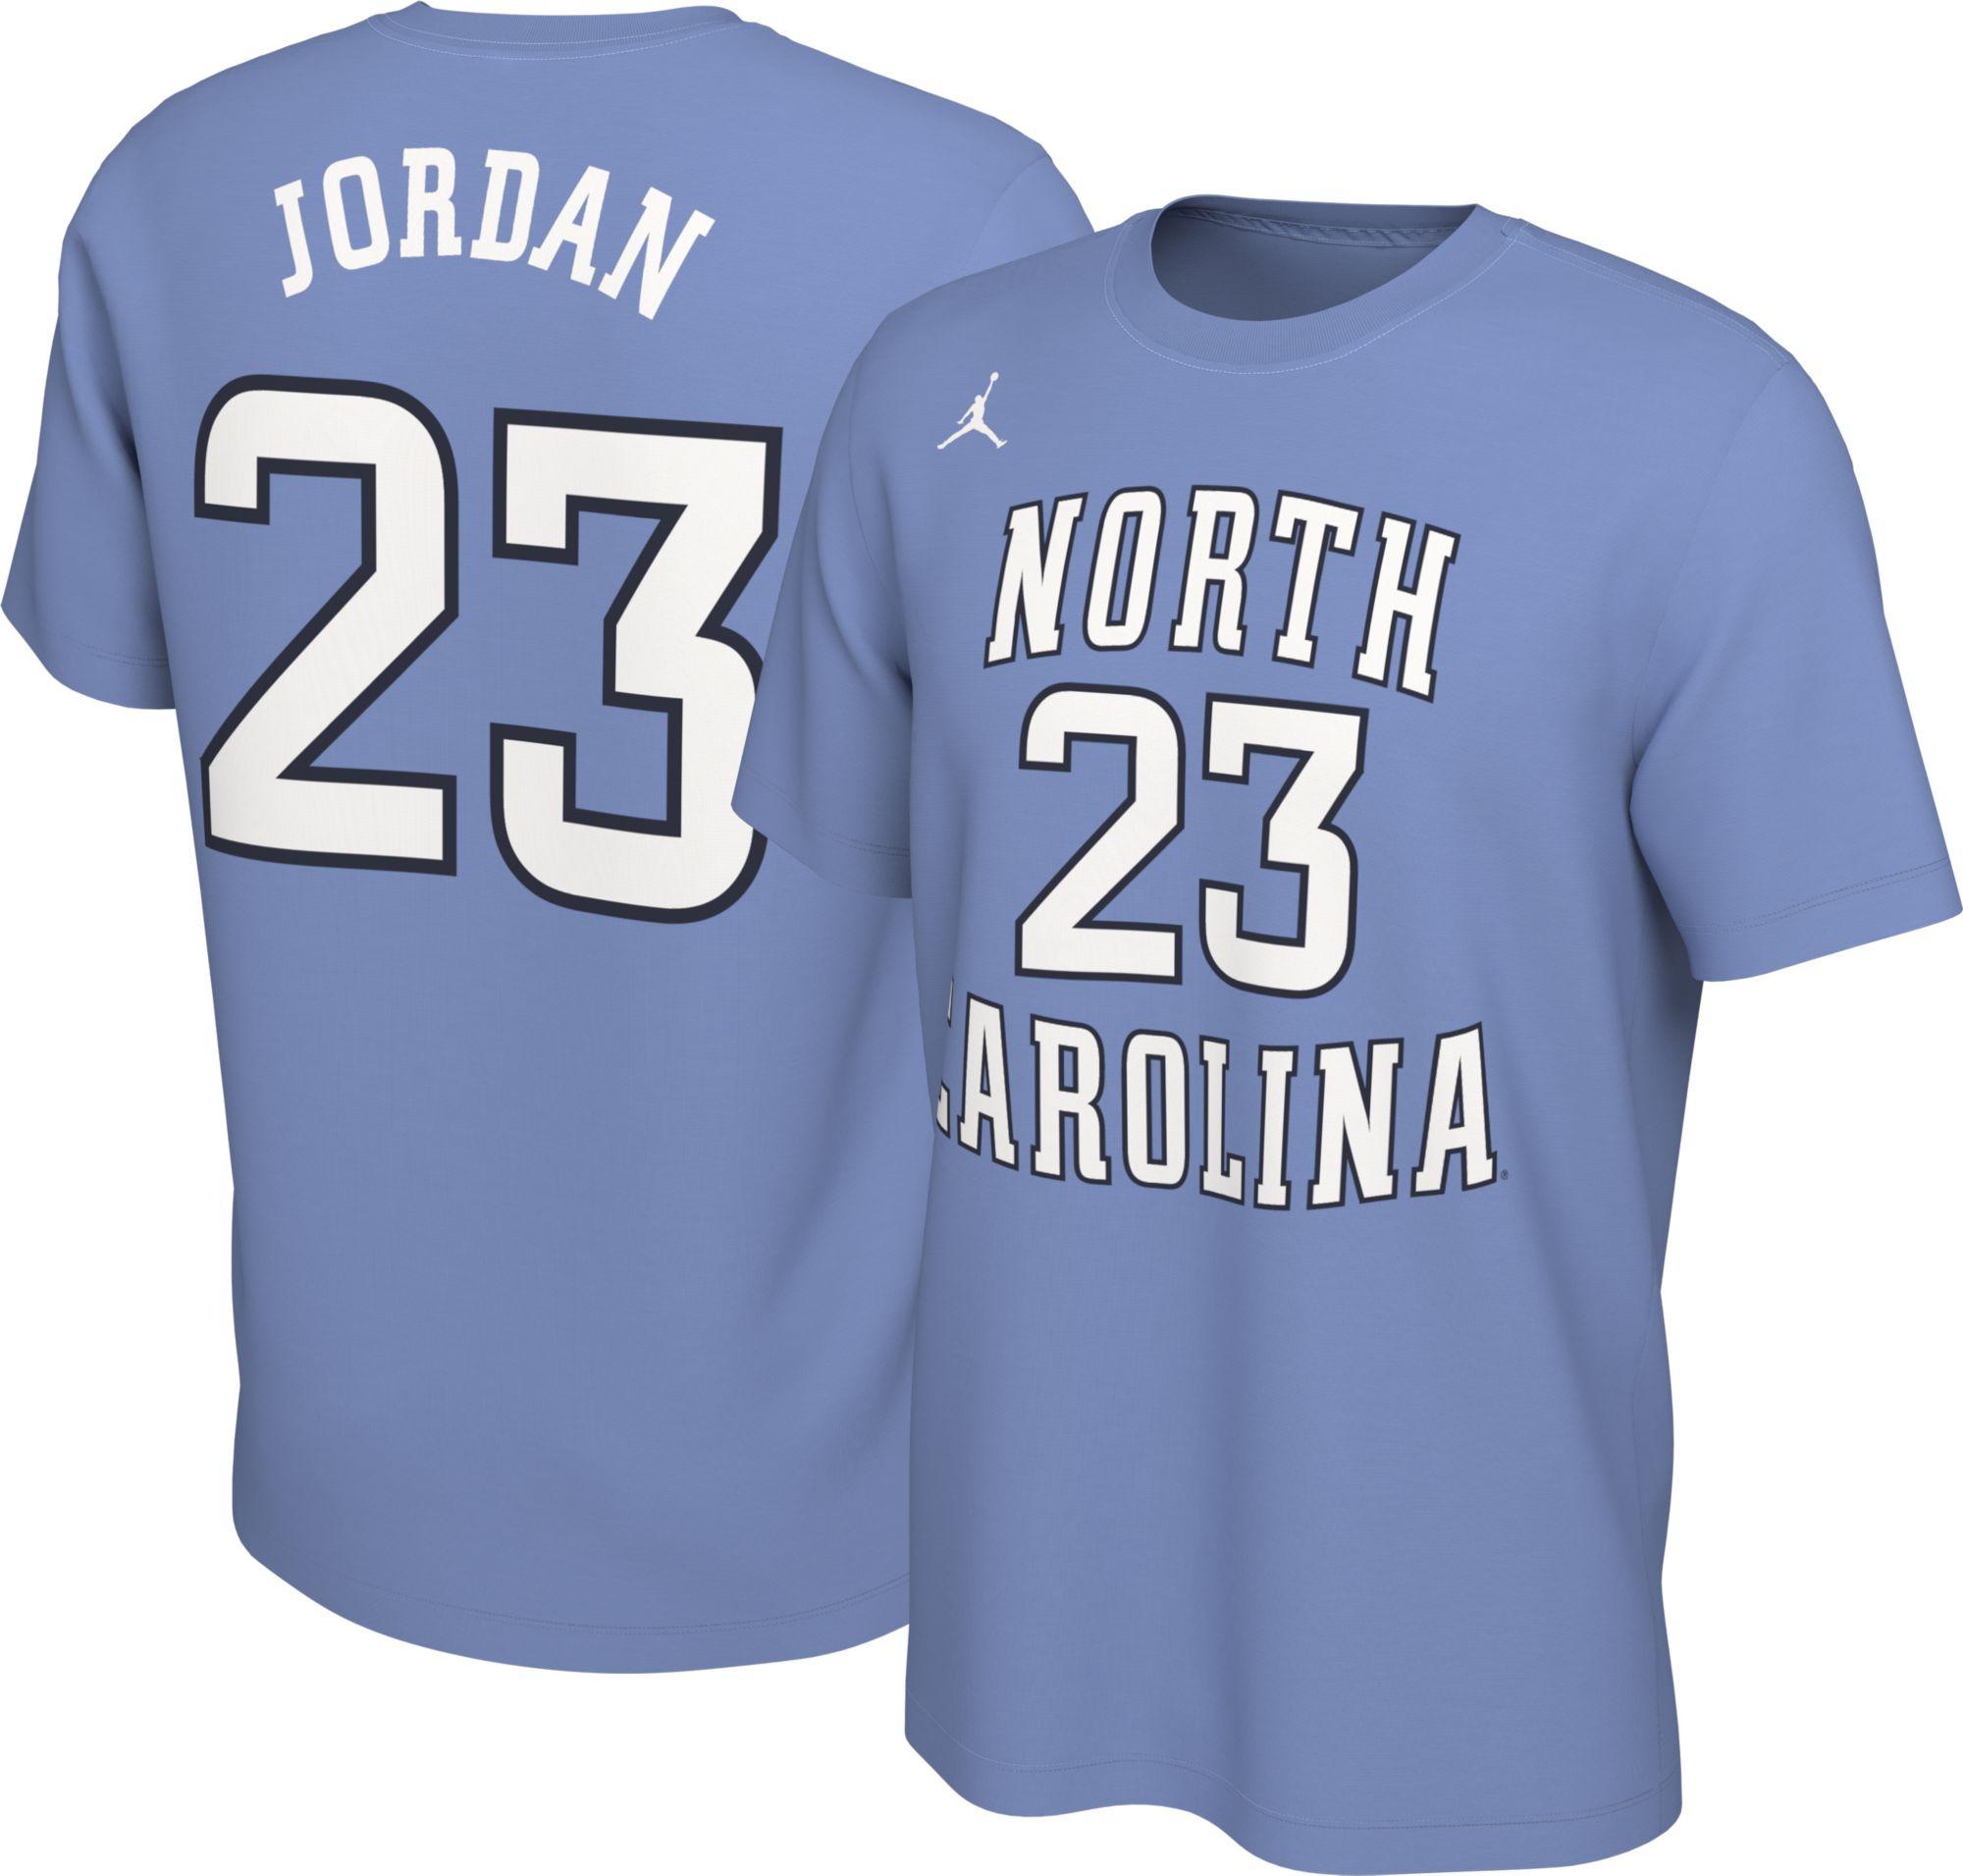 michael jordan t shirt jersey